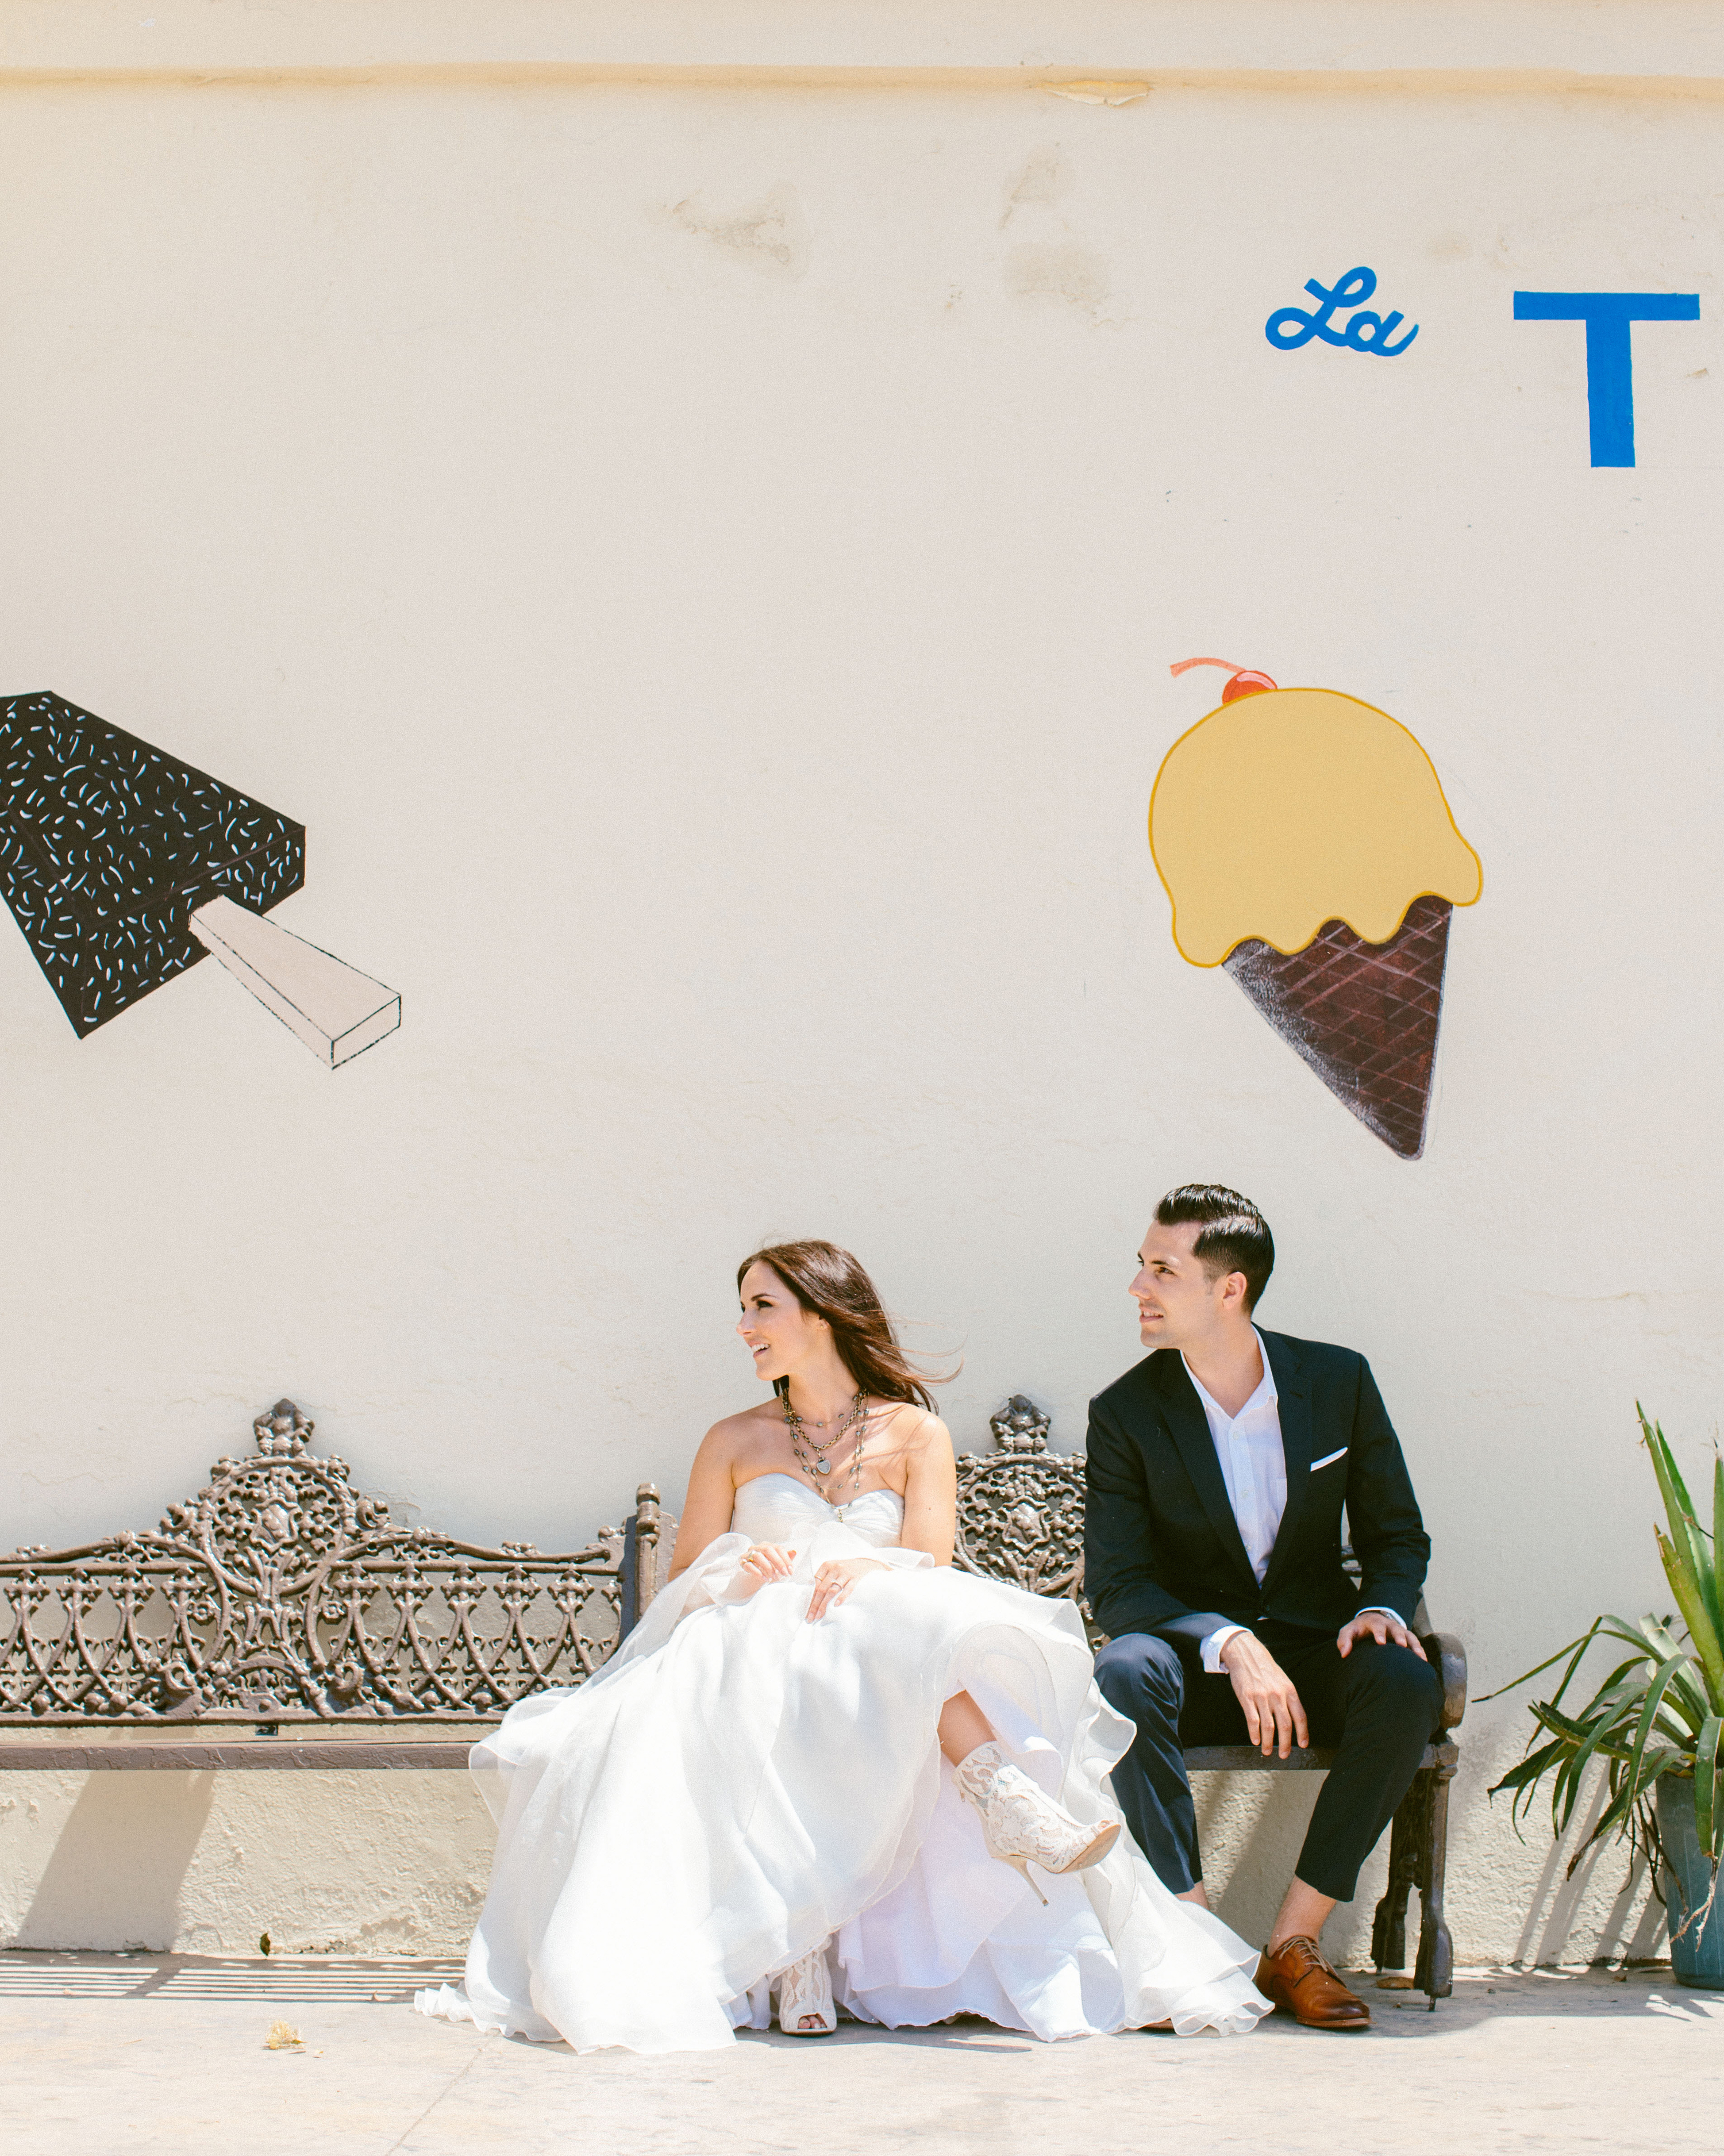 ali-jess-wedding-couple-067-002-s111717-1214.jpg